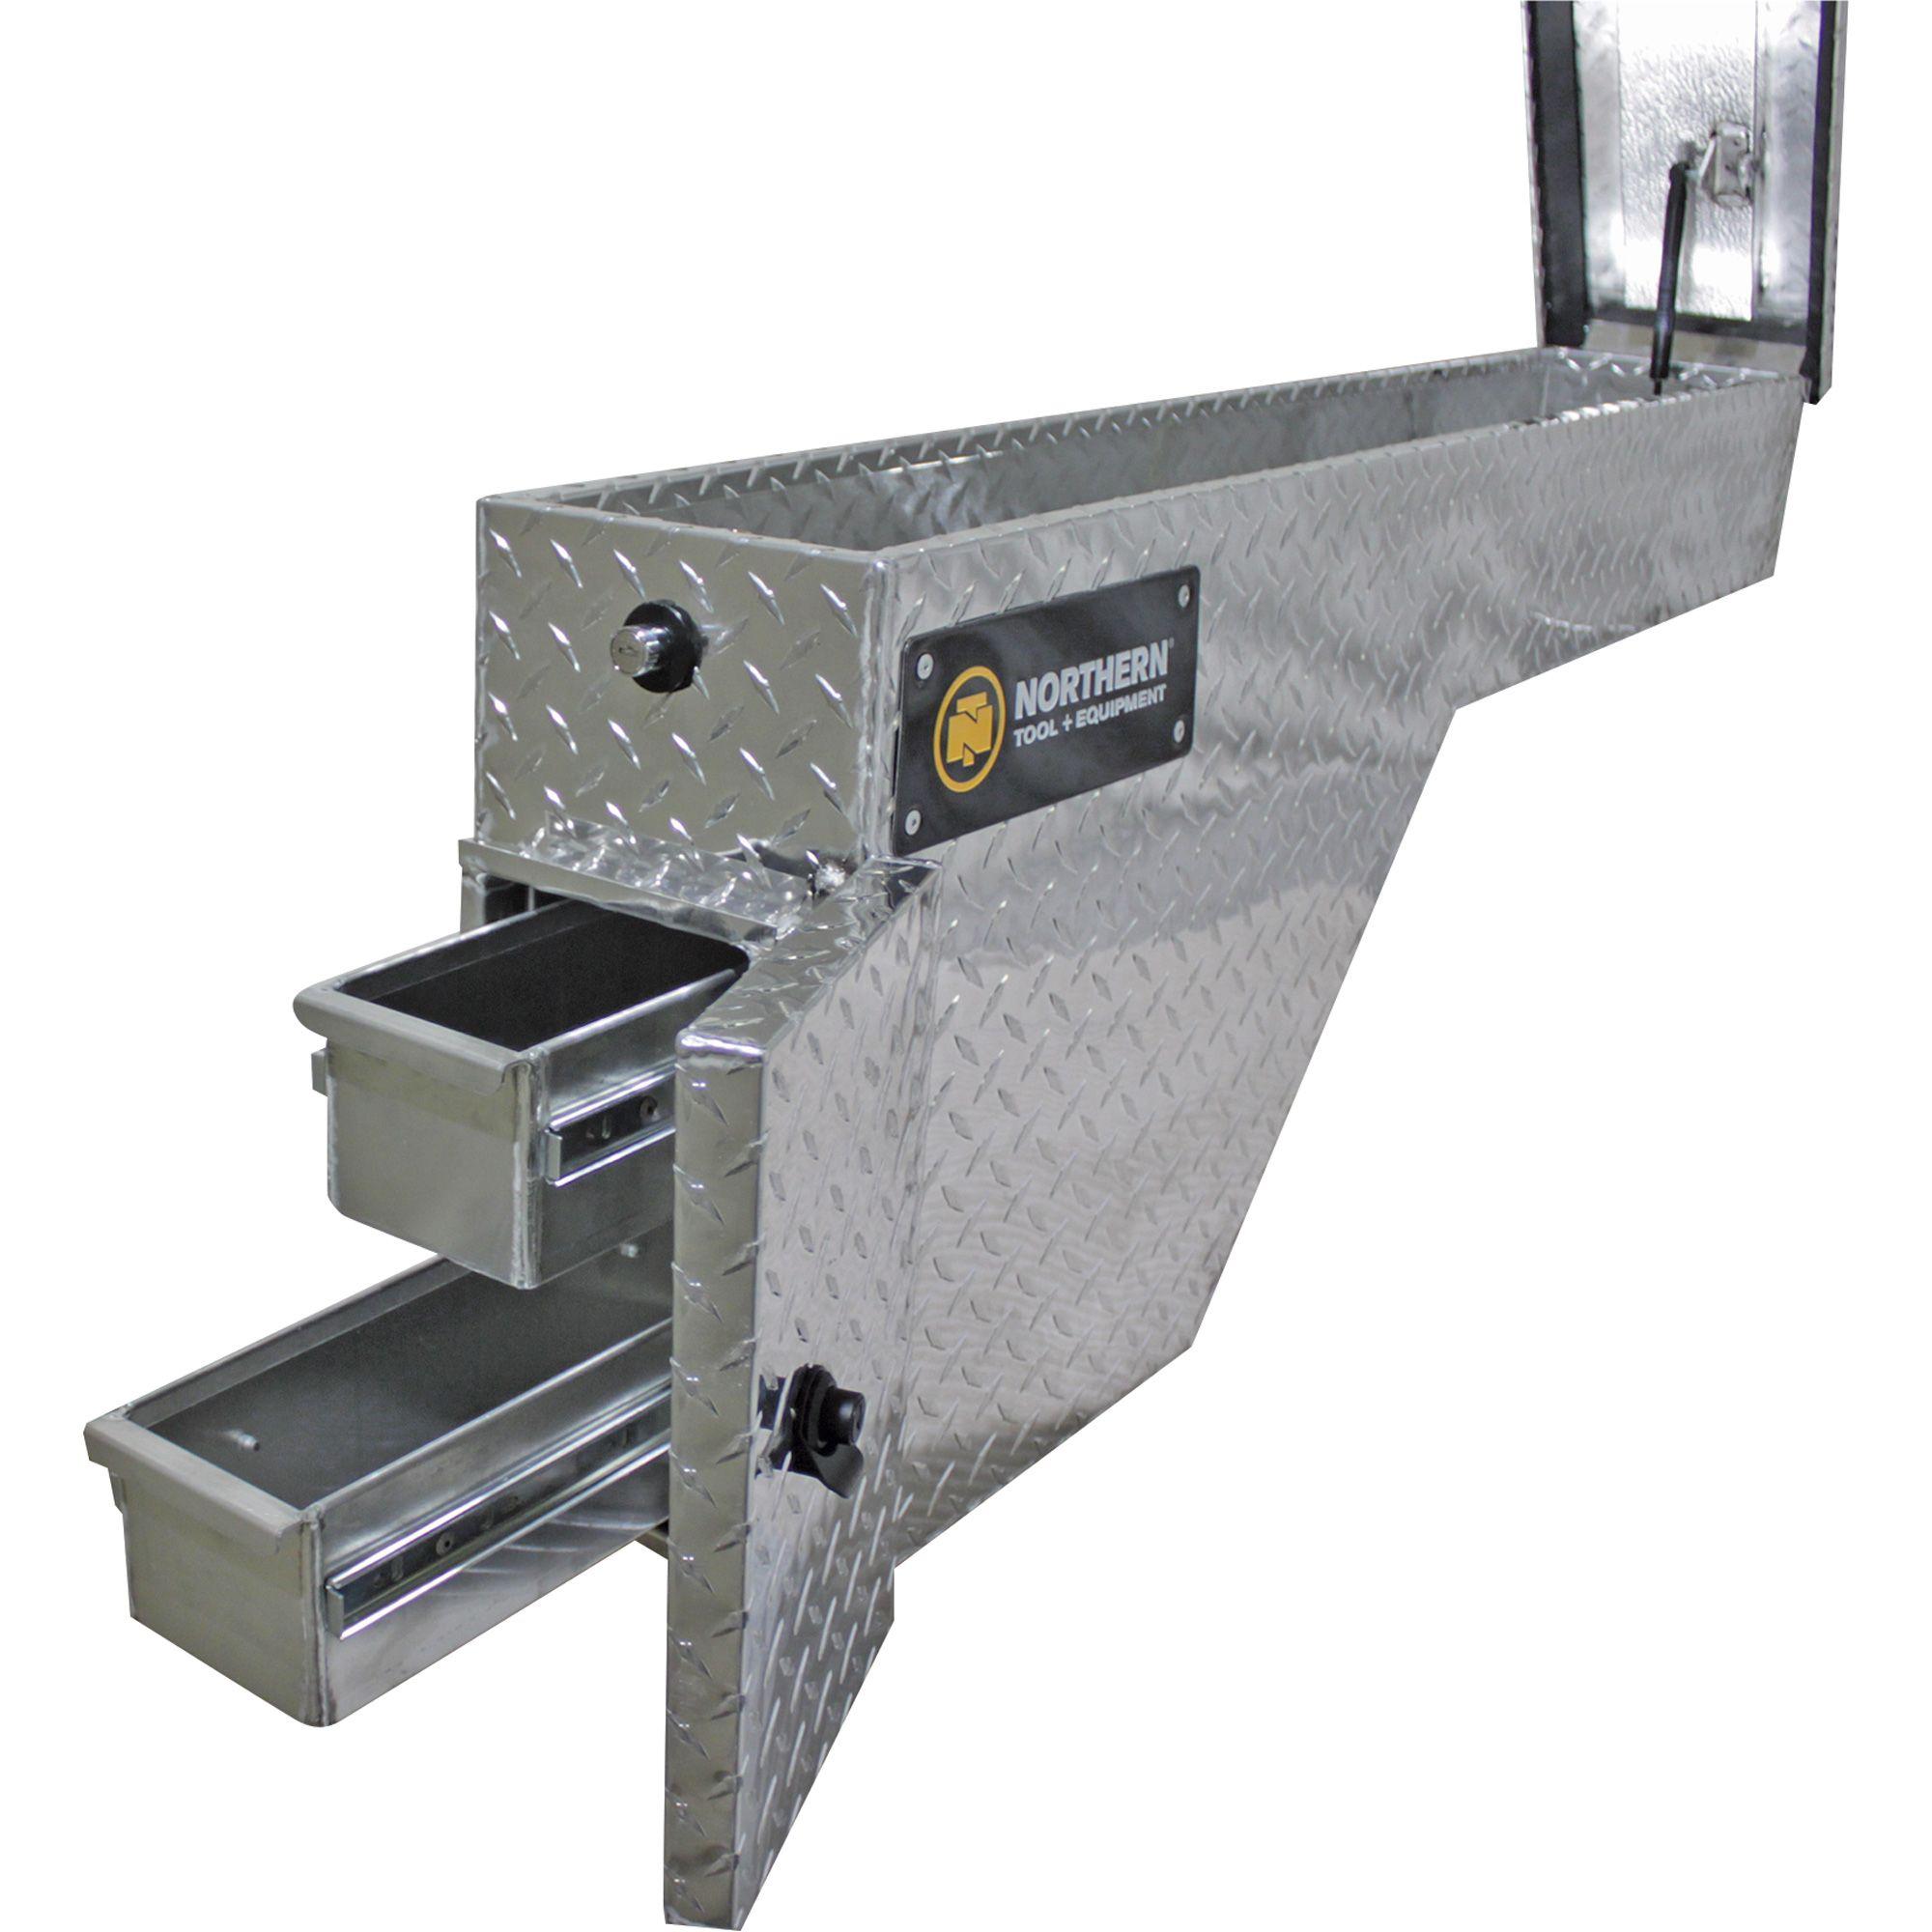 Wheel Well Truck Tool Box with 2 Drawers Aluminum, Diamond